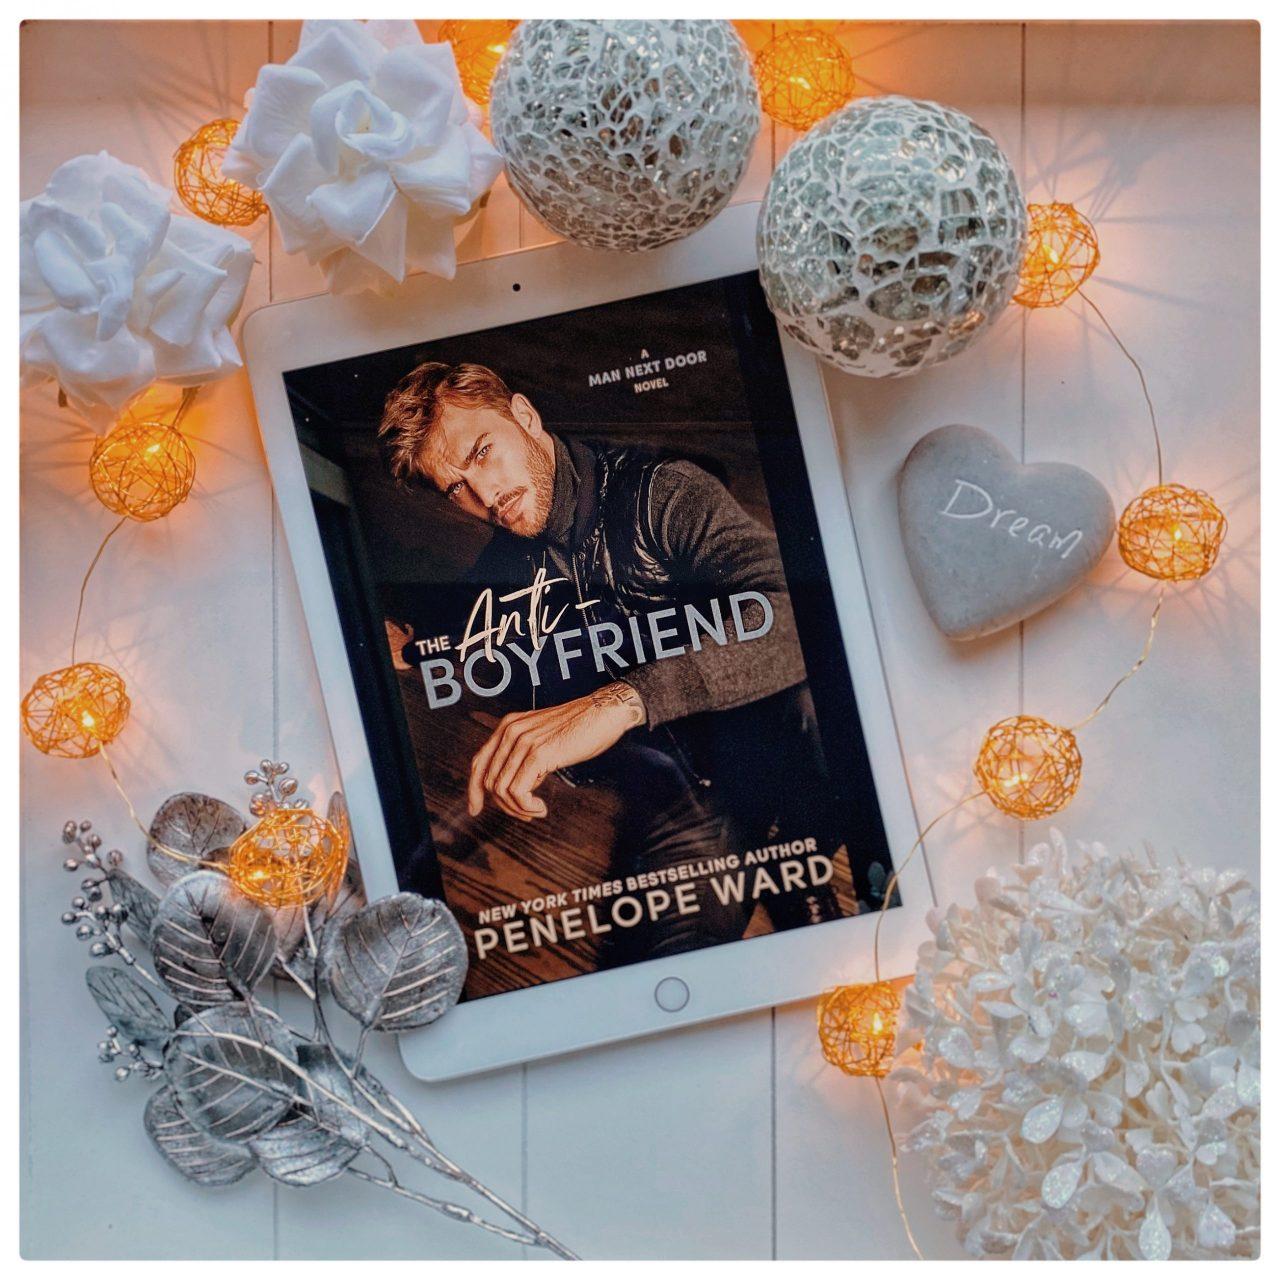 Penelope Ward - The Anti-Boyfriend Bookpic ilovebooksblog.com